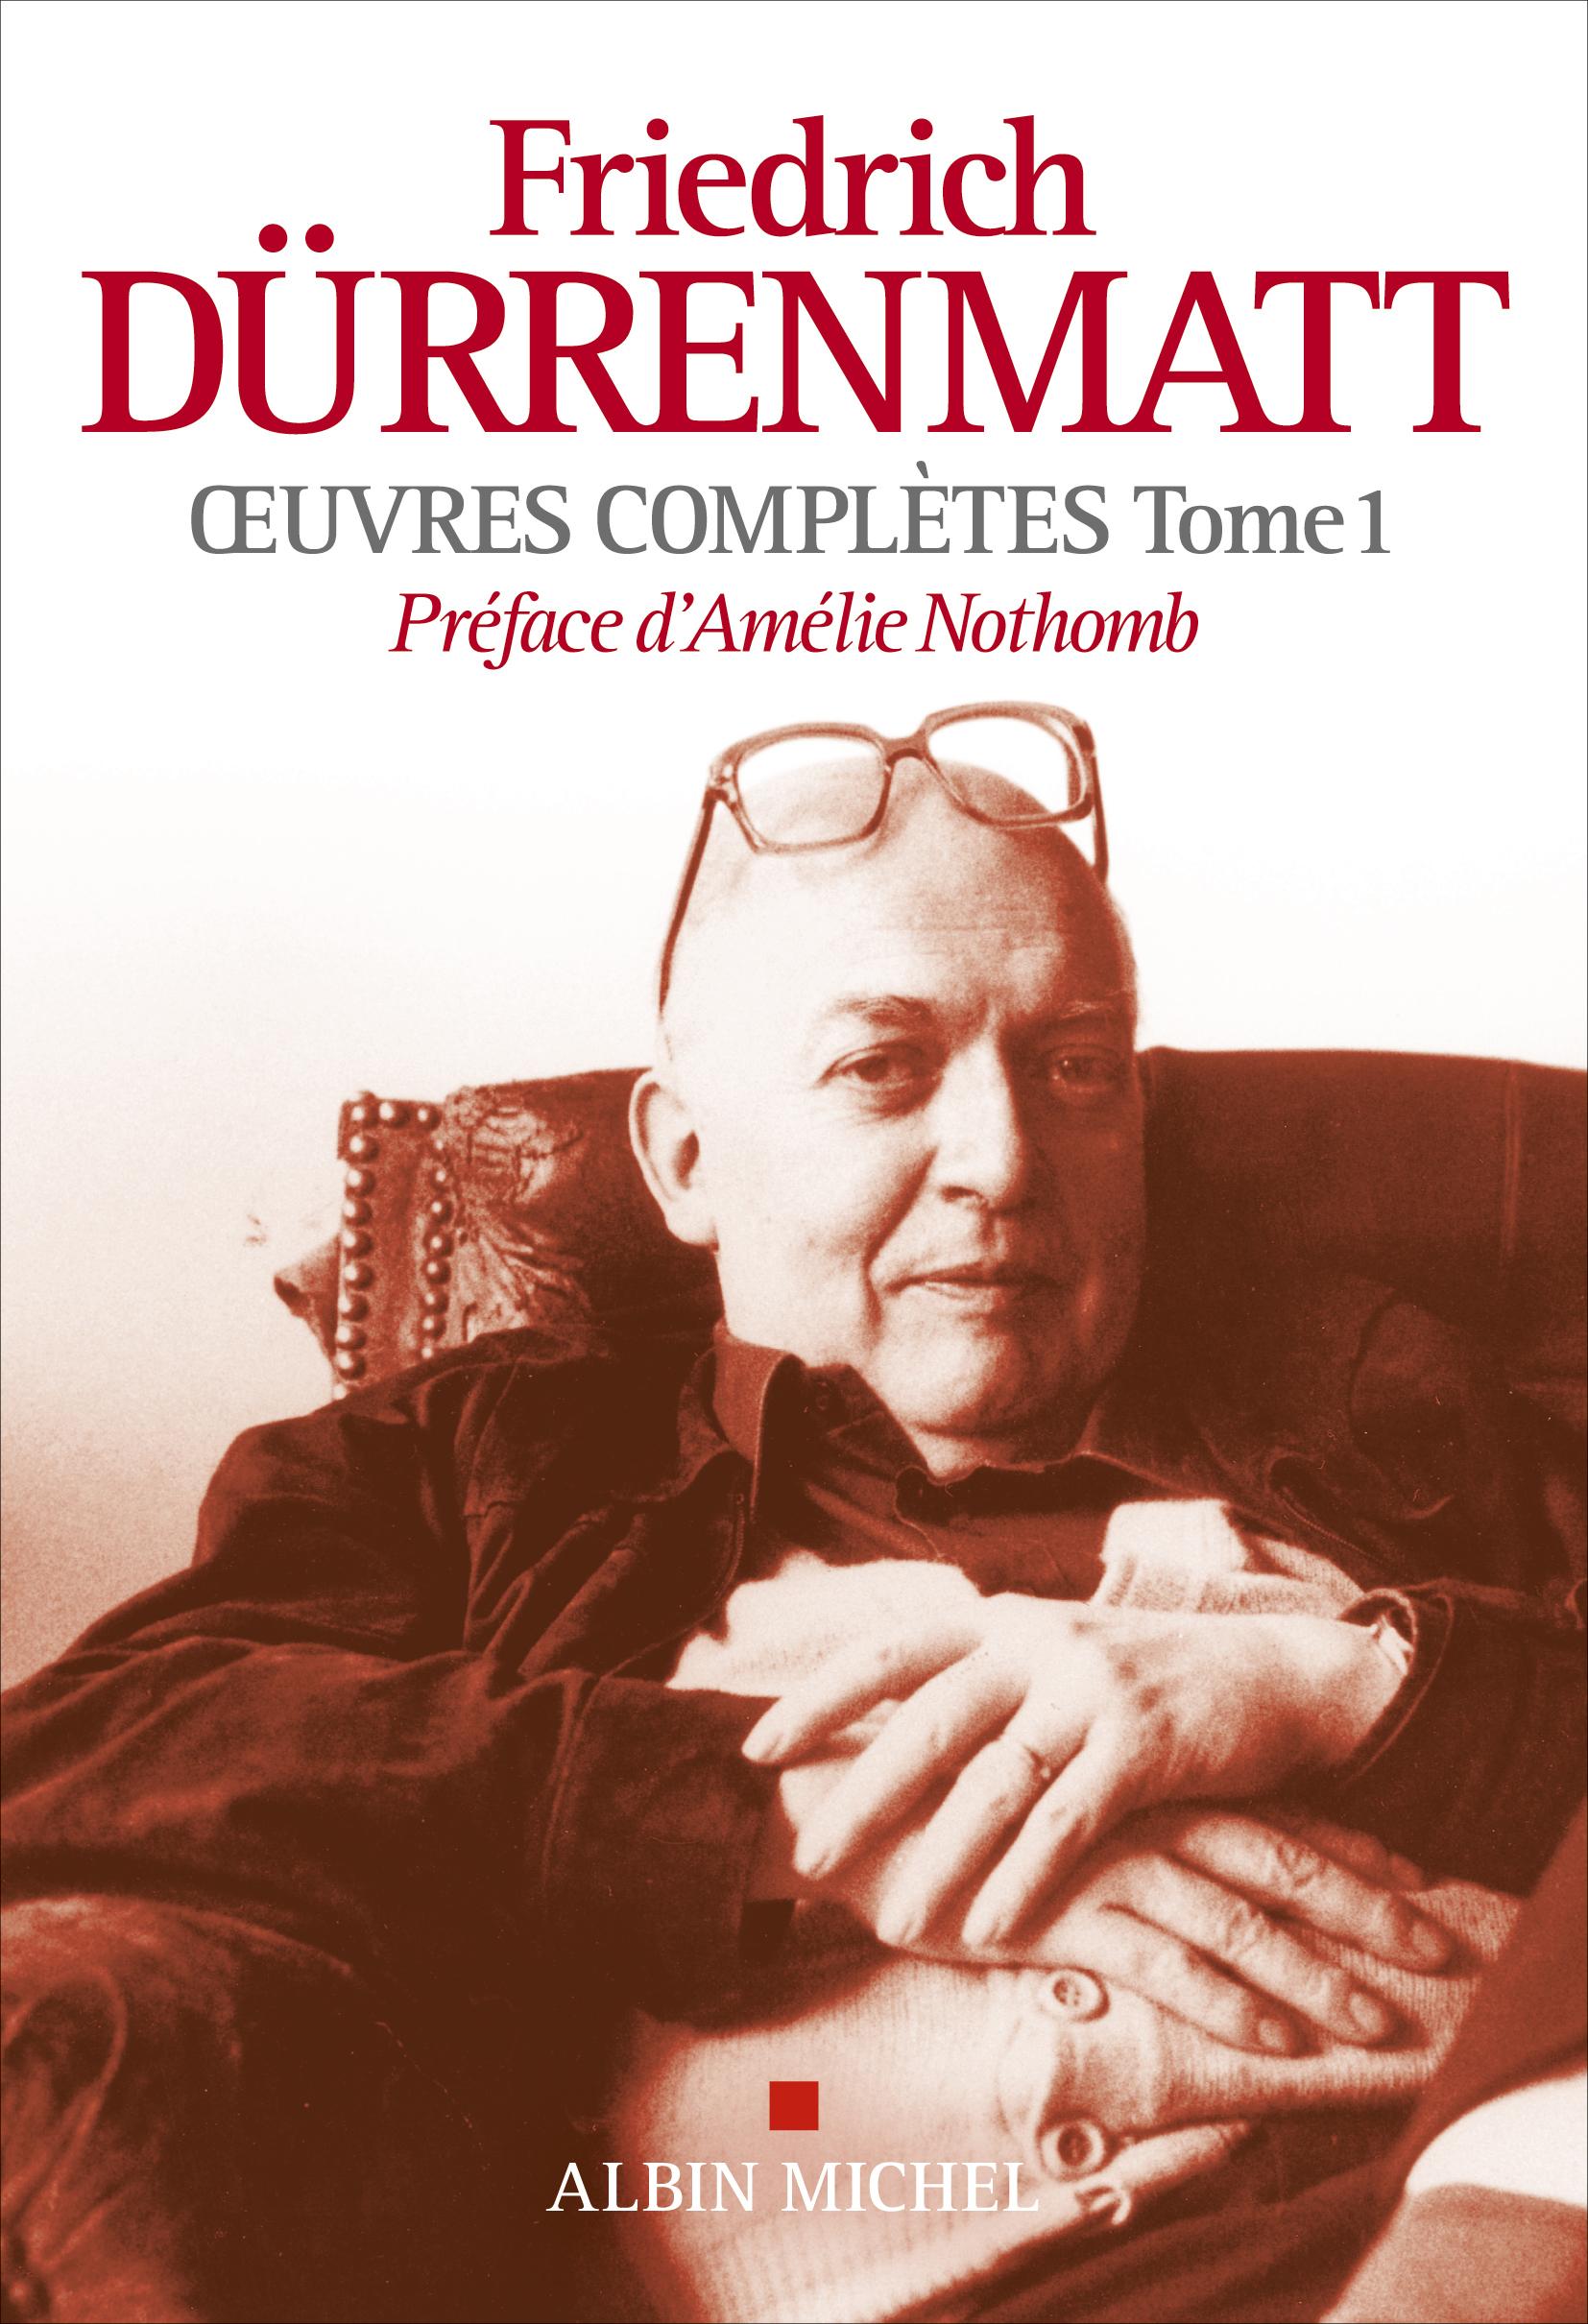 F. Dürrenmatt, Oeuvres complètes (t. 1)